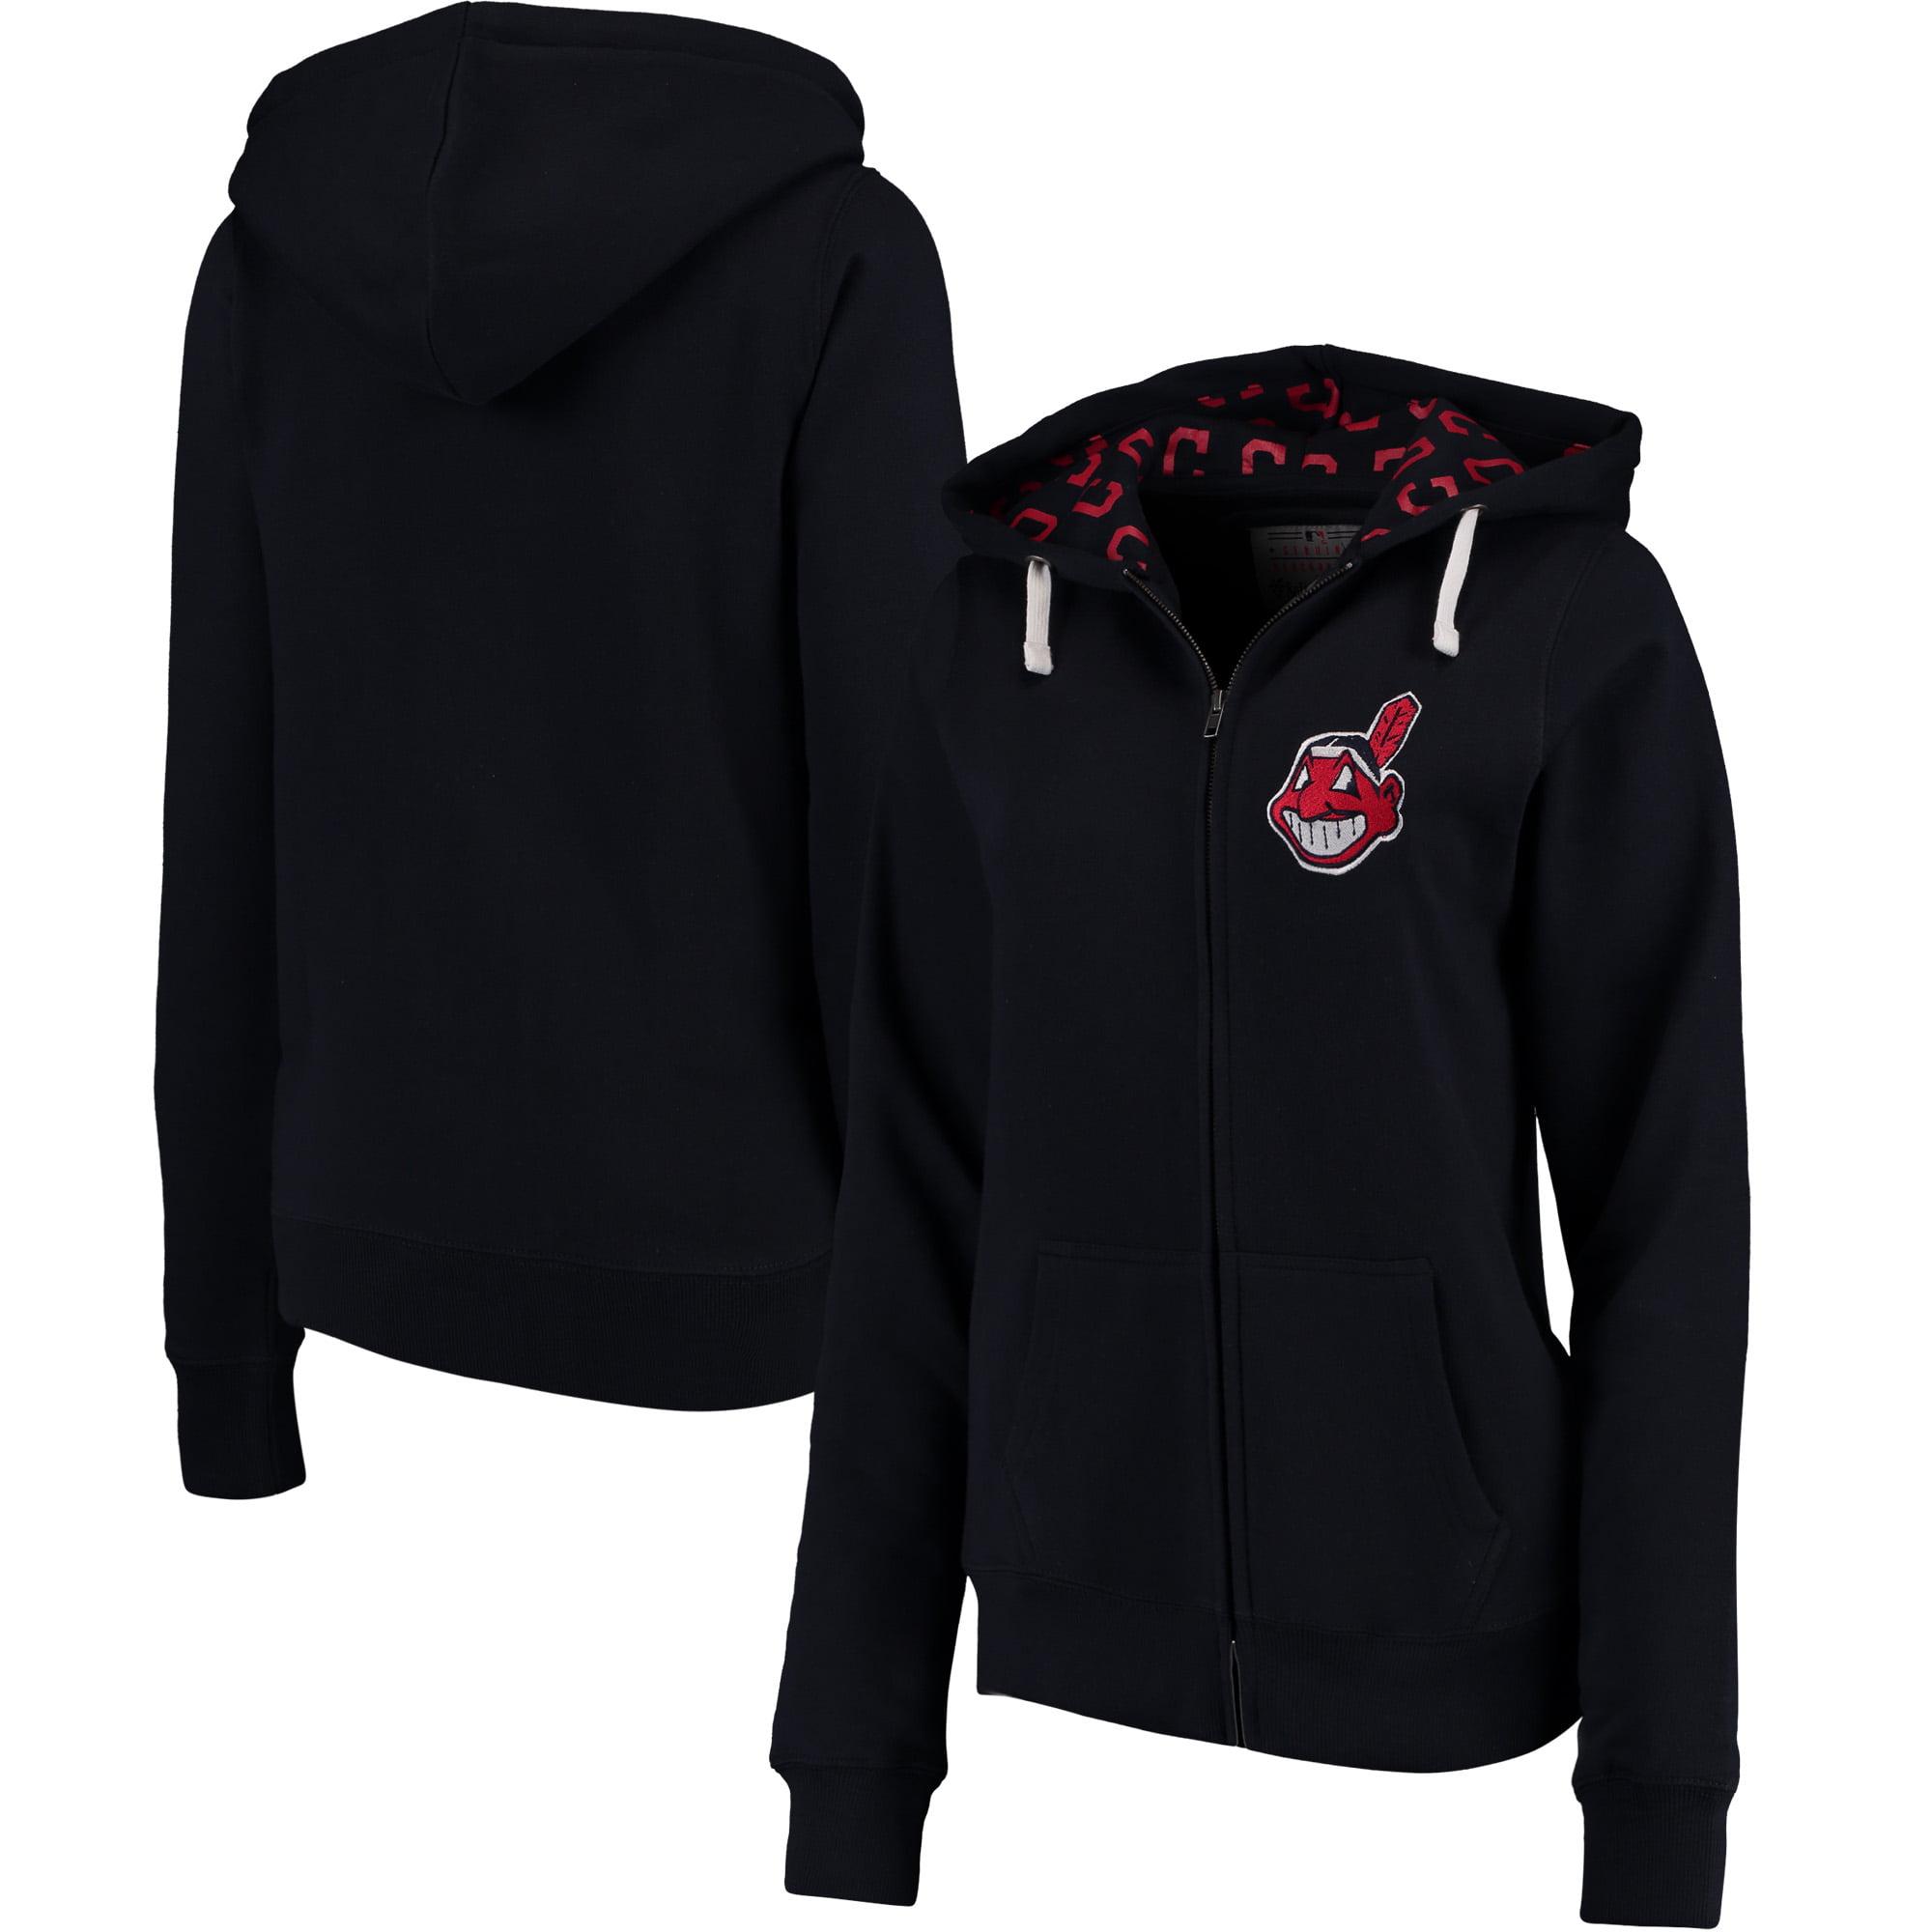 Cleveland Indians Soft as a Grape Women's Line Drive Full-Zip Hoodie - Navy